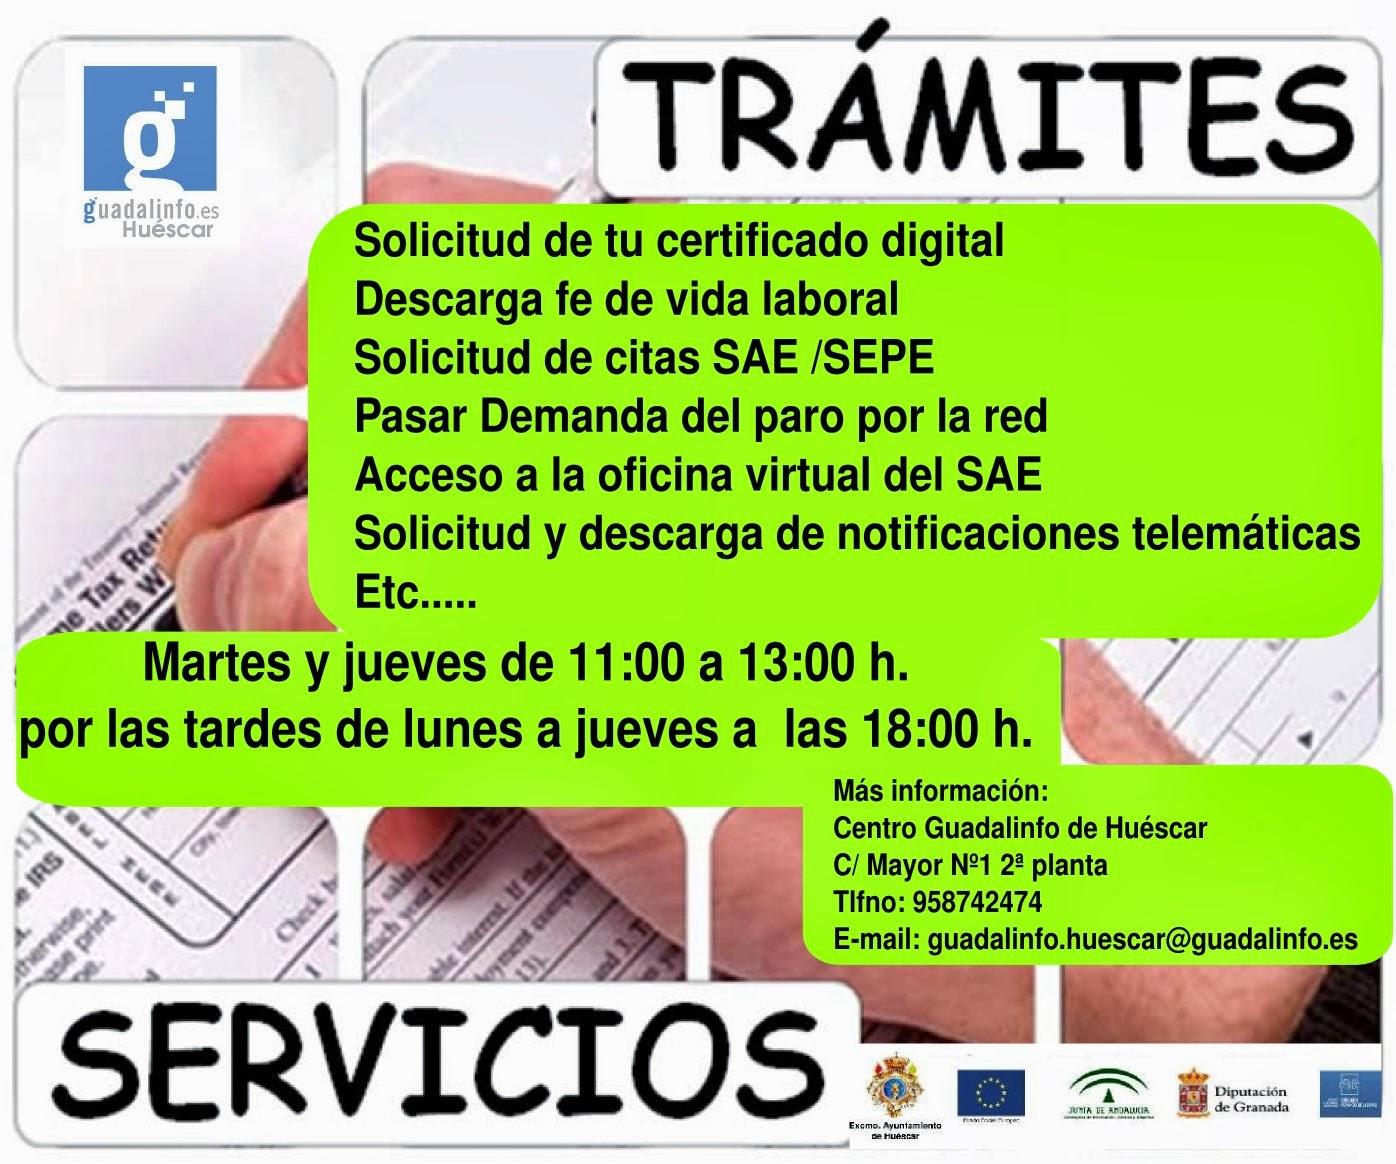 Centro Guadalinfo De Huescar Tramites Administrativos Solicitud De